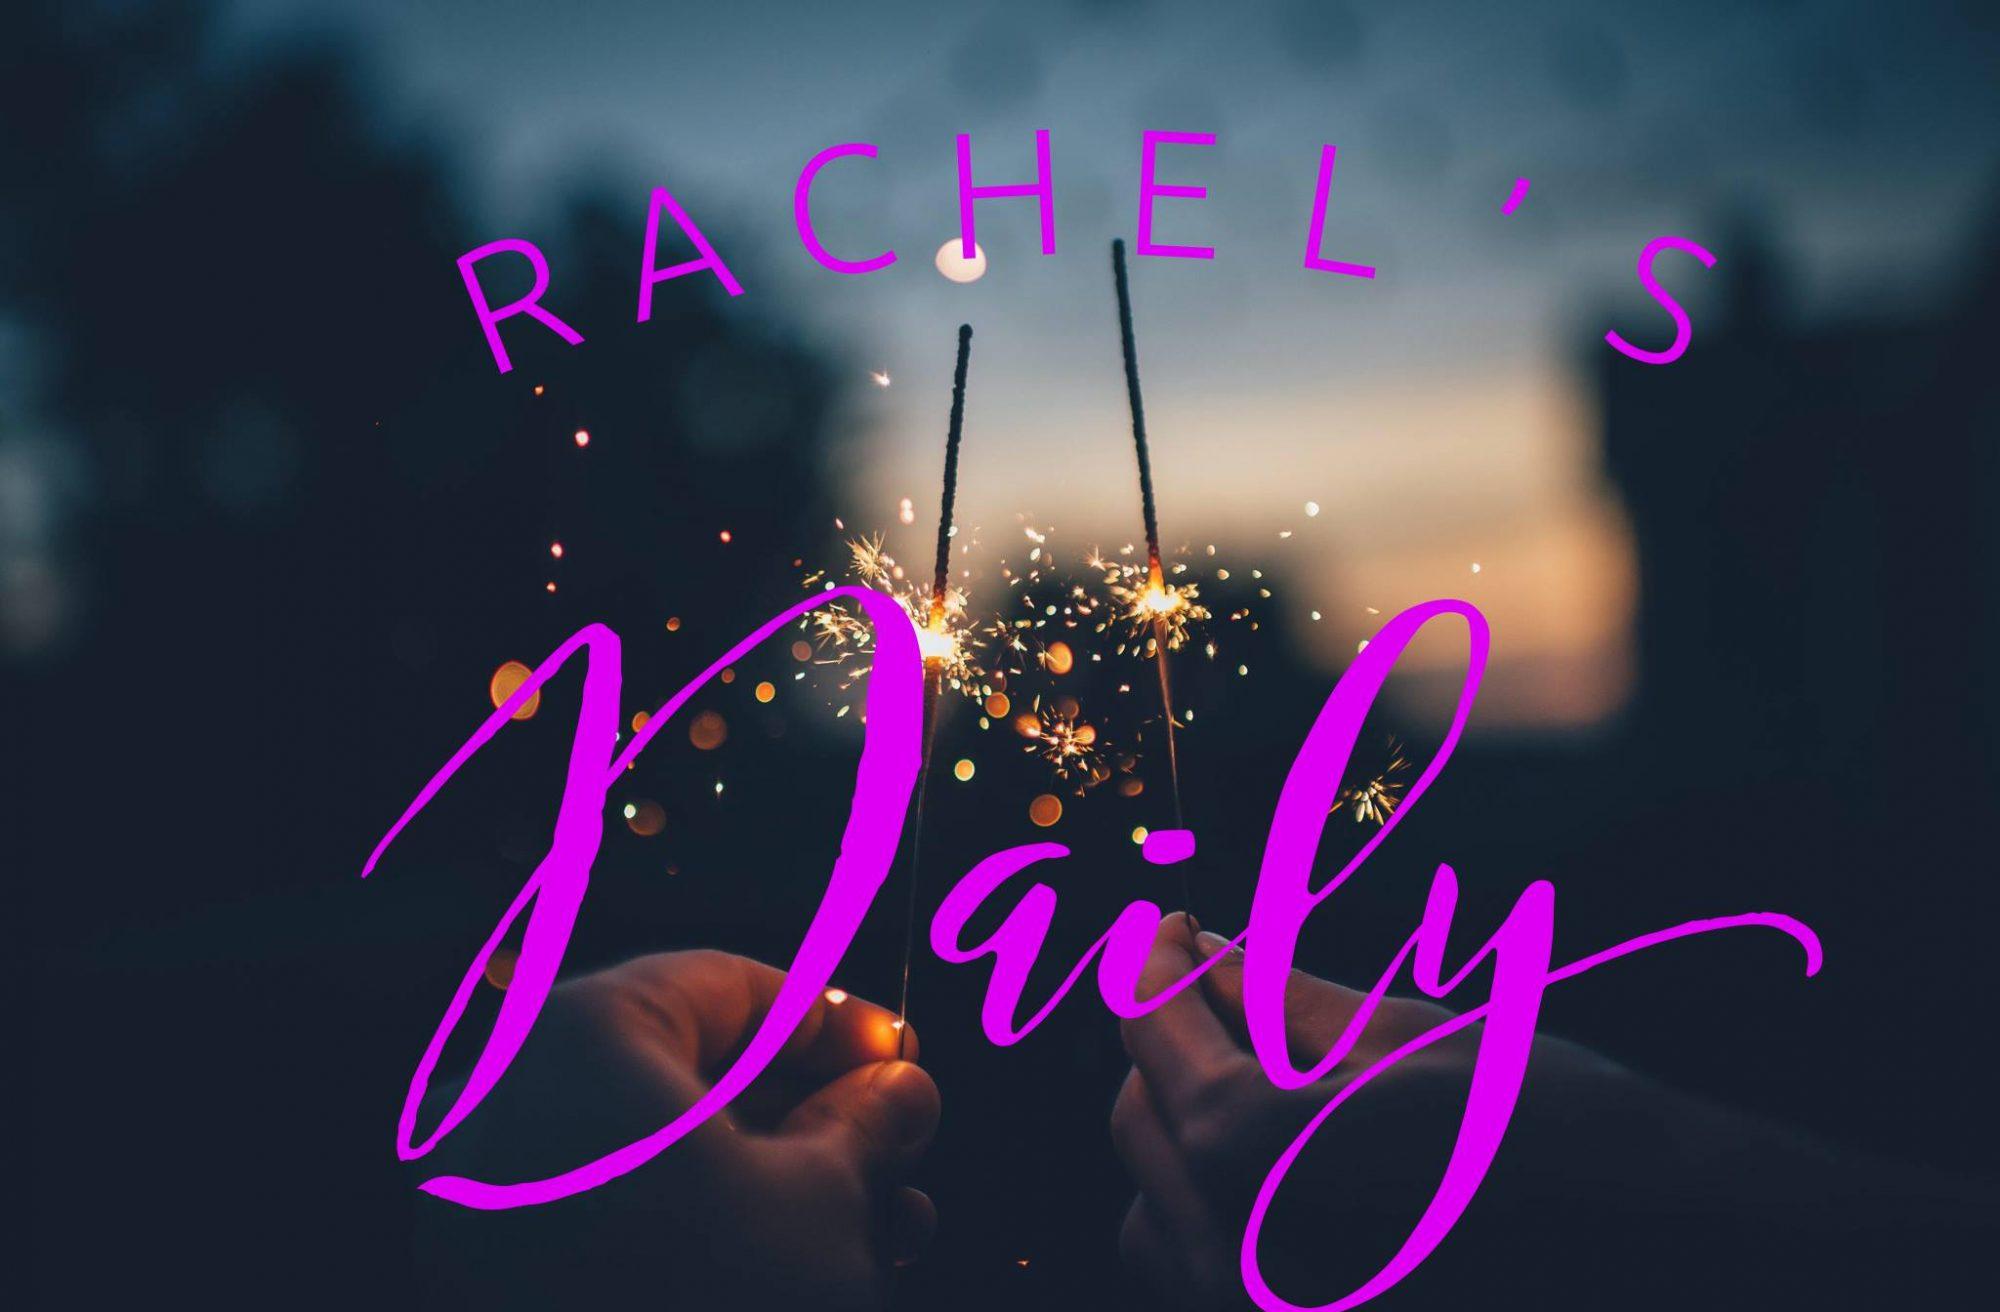 Rachel's Daily